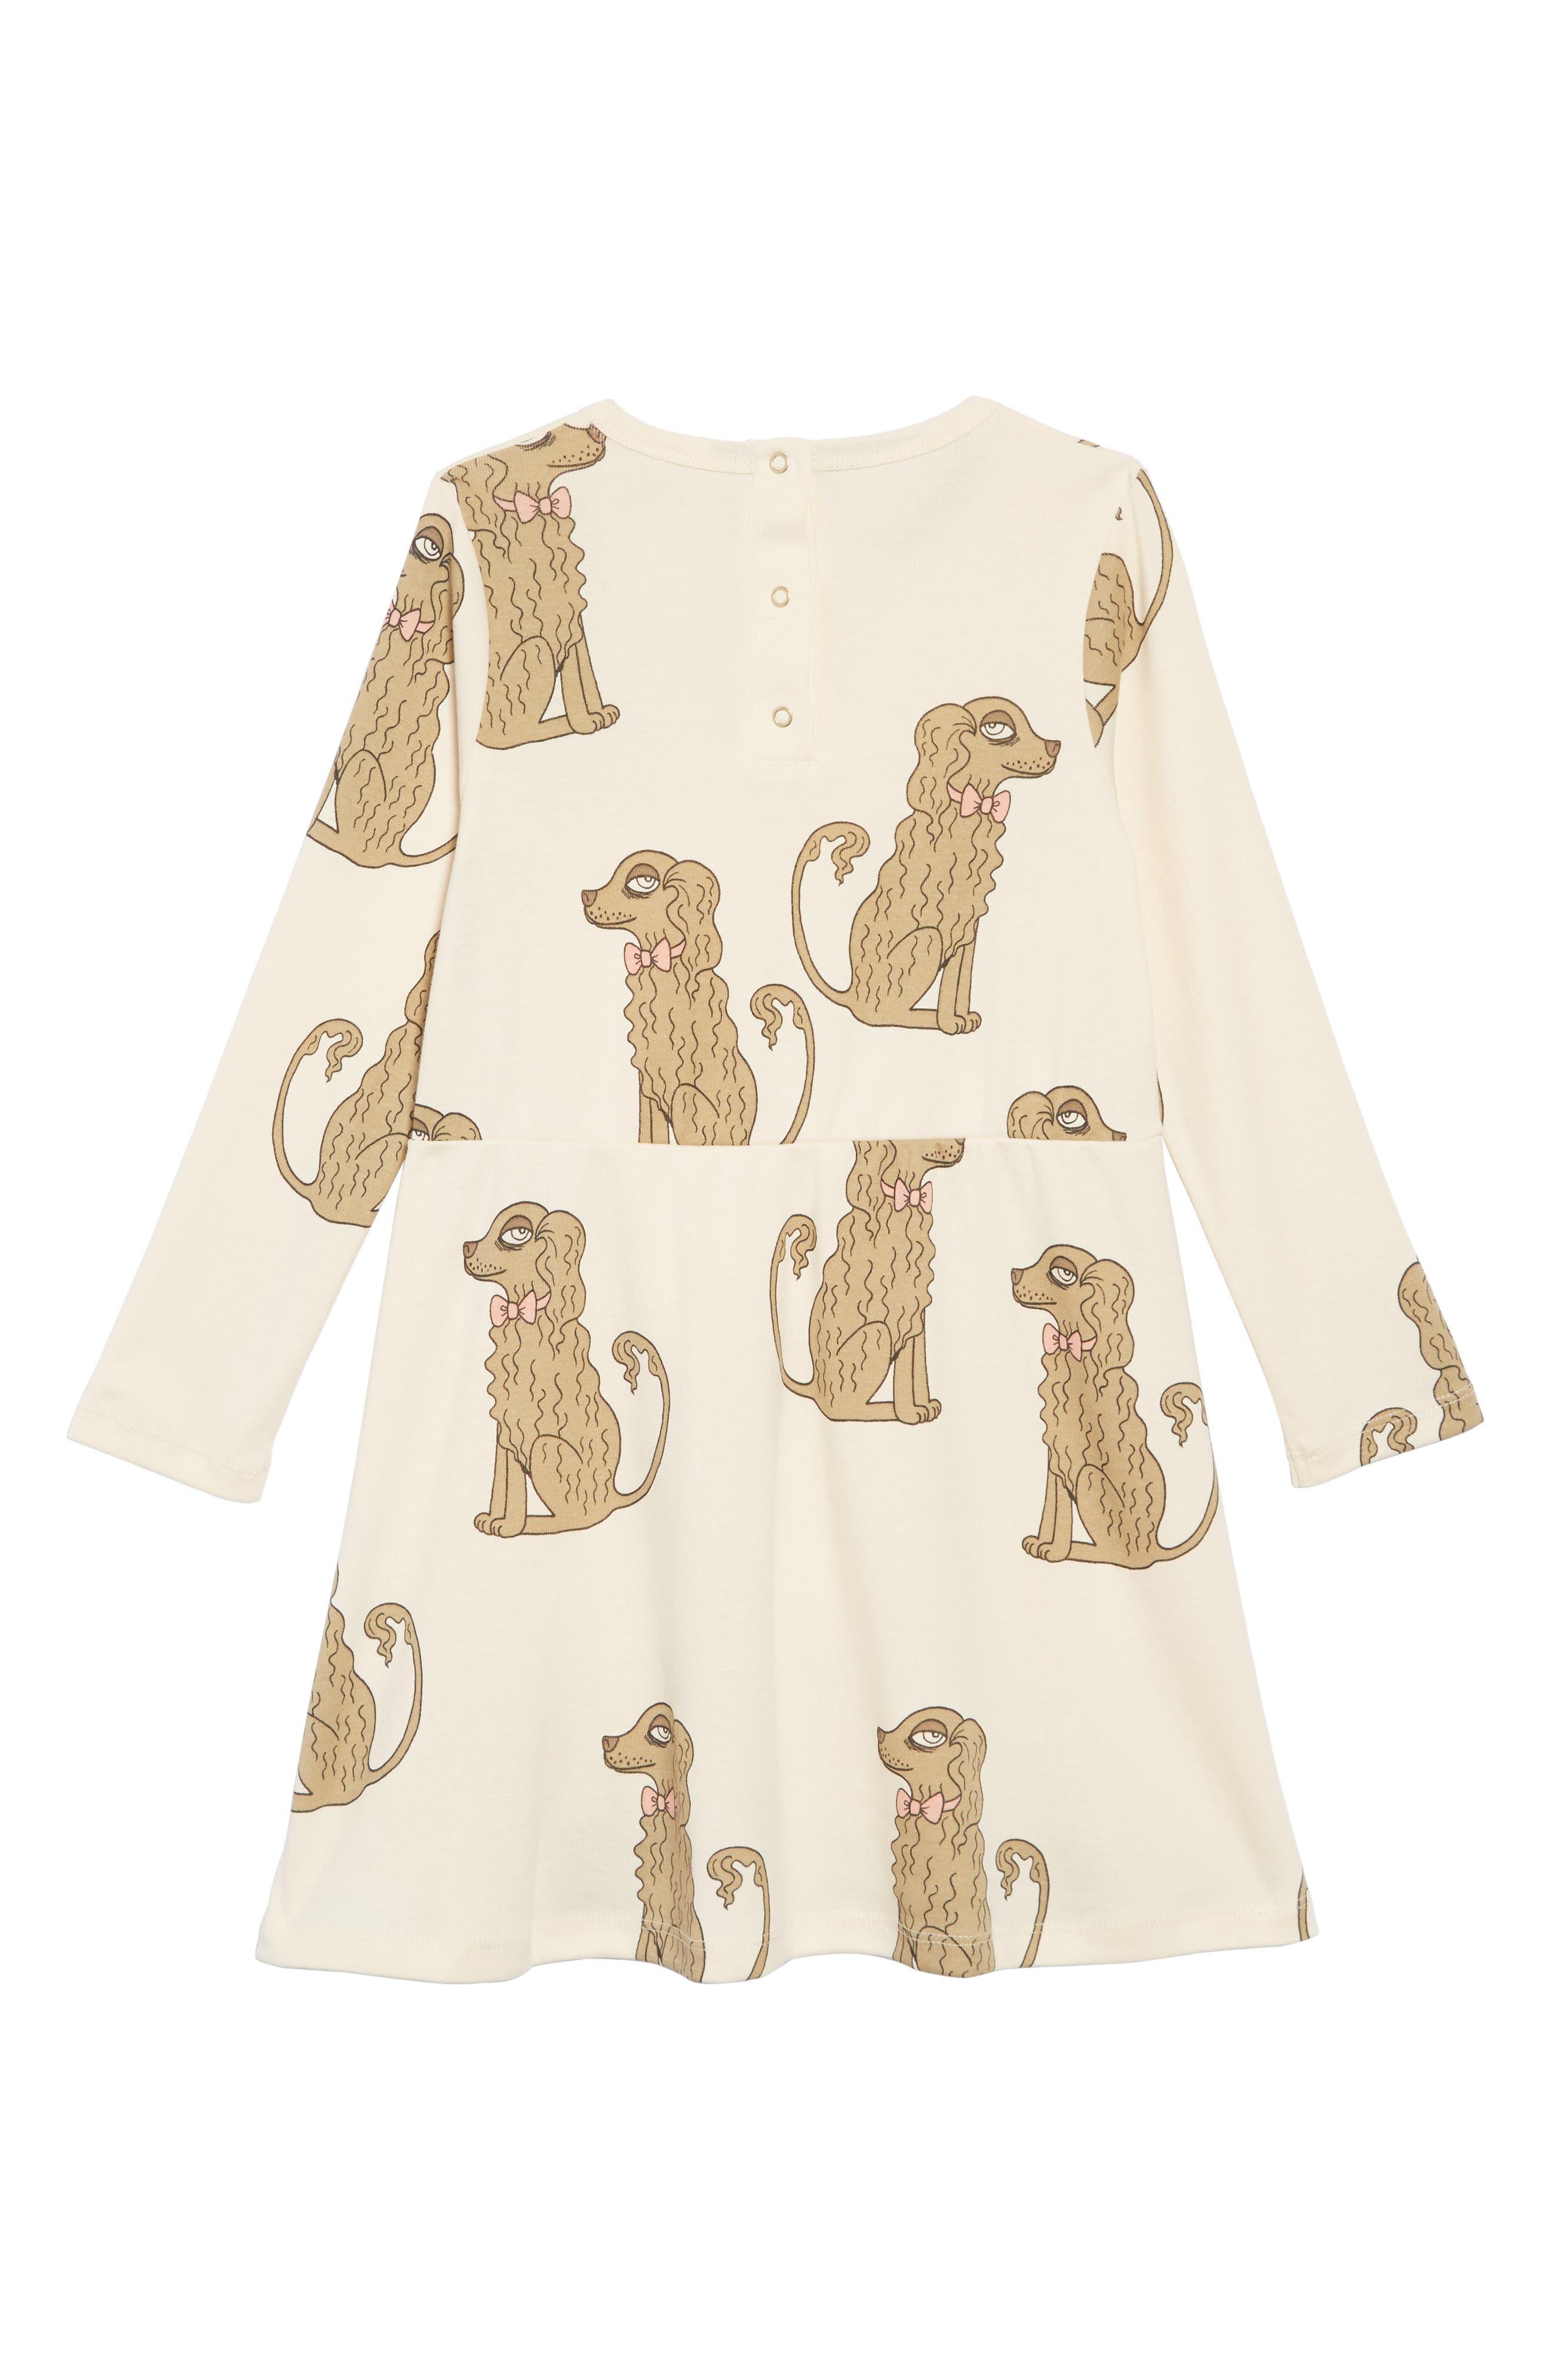 Spaniel Organic Cotton Dress,                             Alternate thumbnail 2, color,                             OFF WHITE